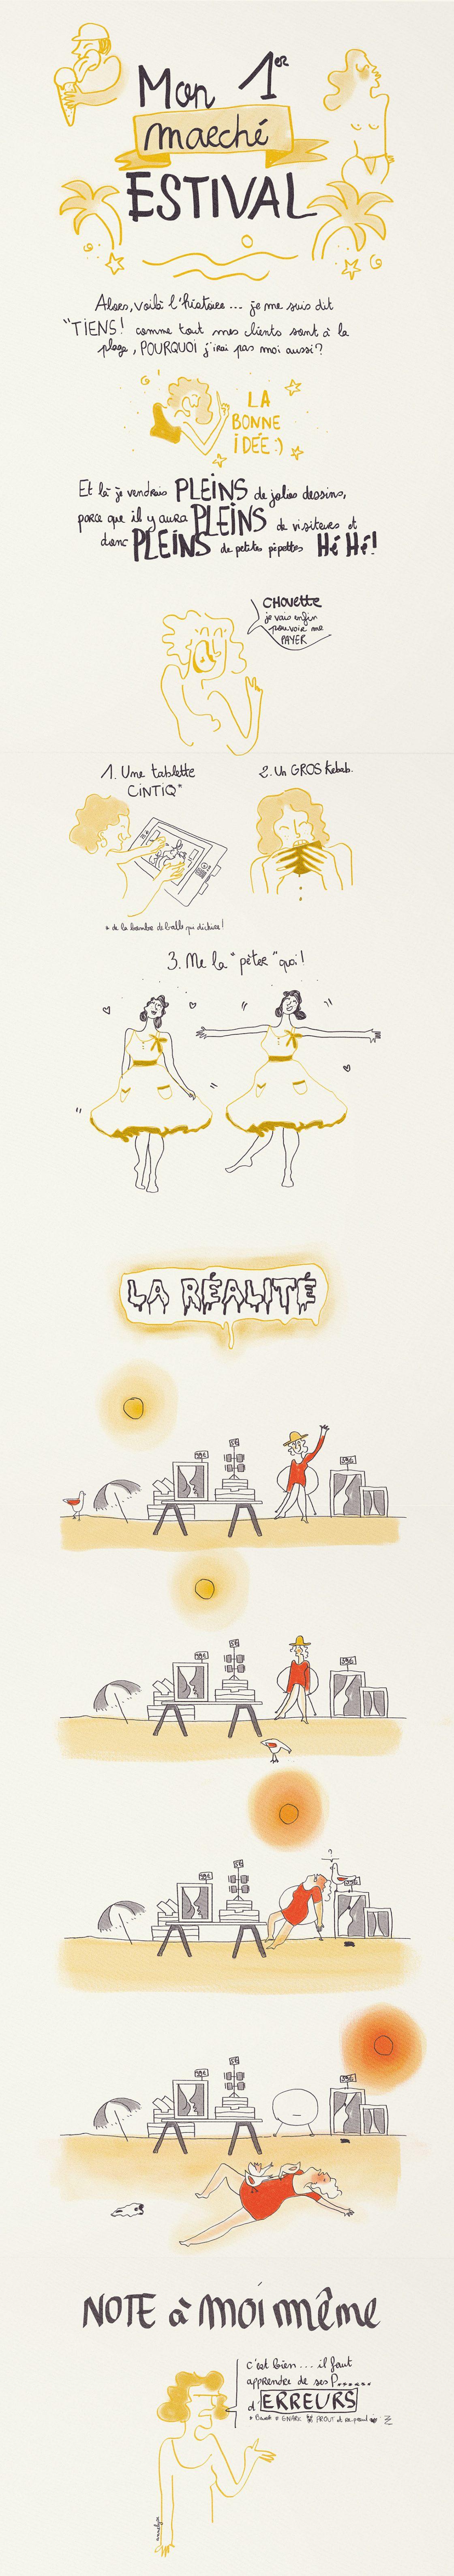 "illustration ""mon 1er marché estival"" by annelyse.fr"